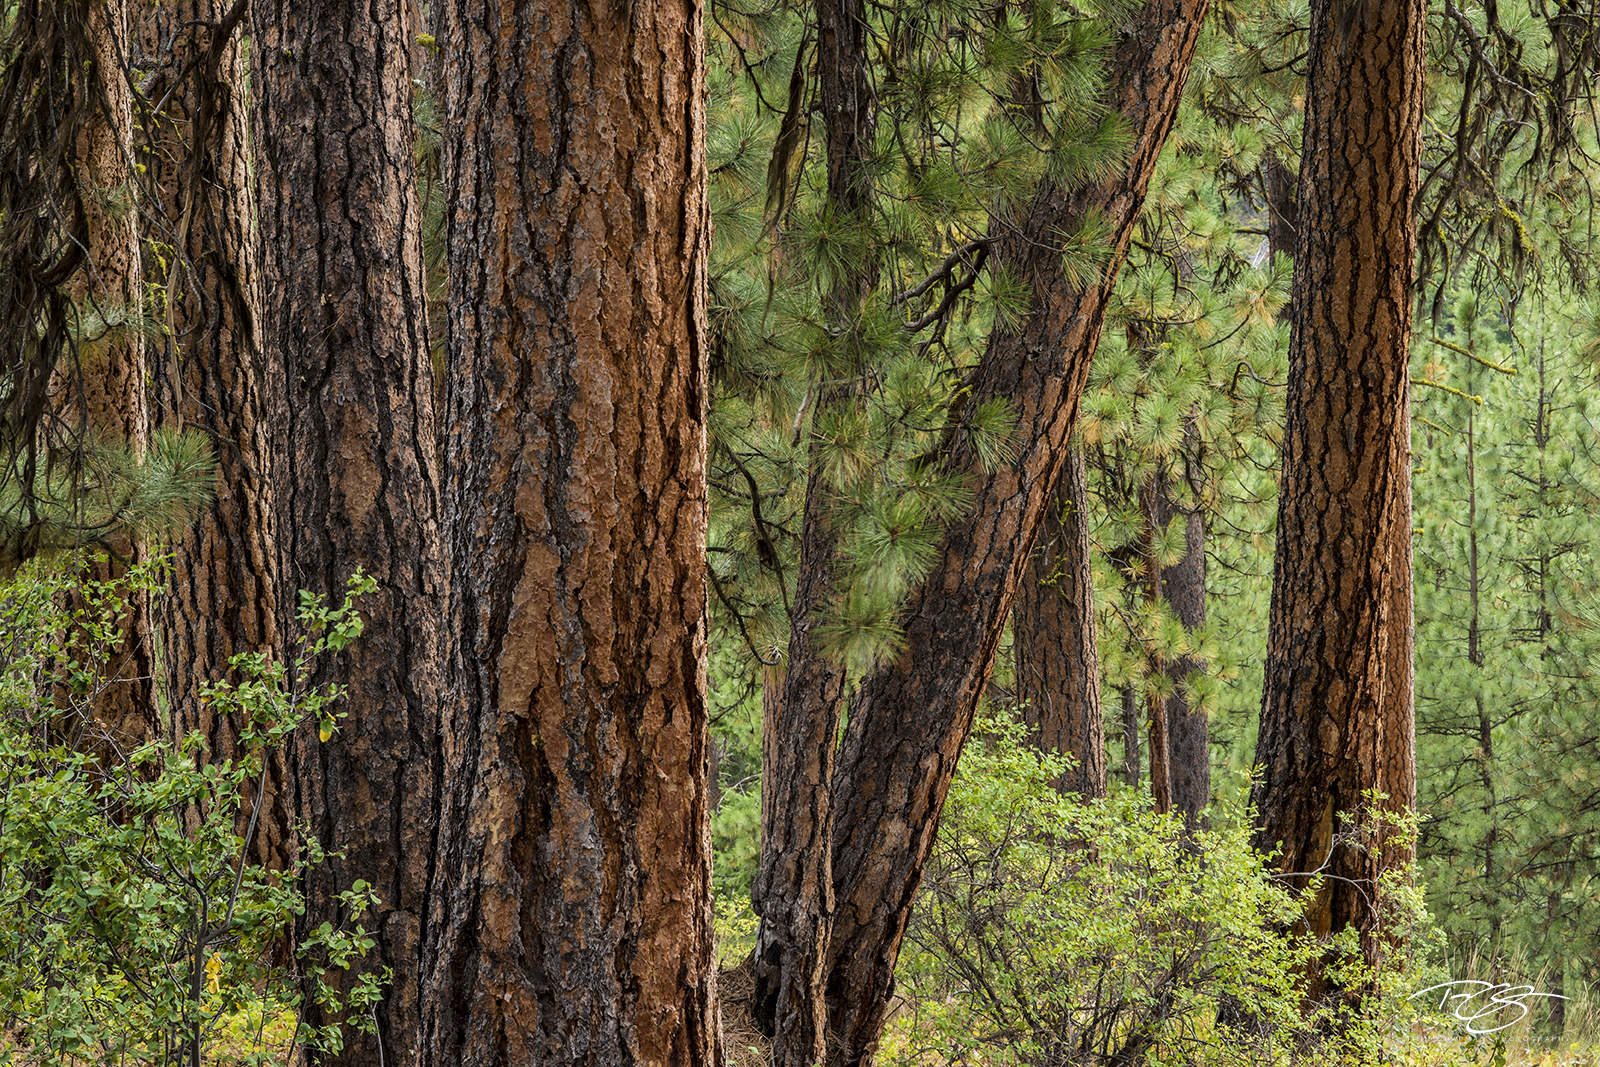 trees, forest, pines, evergreens, ponderosa pine, ponderosas bark, green, red, brown, earth tone, idaho, arizona, colorado